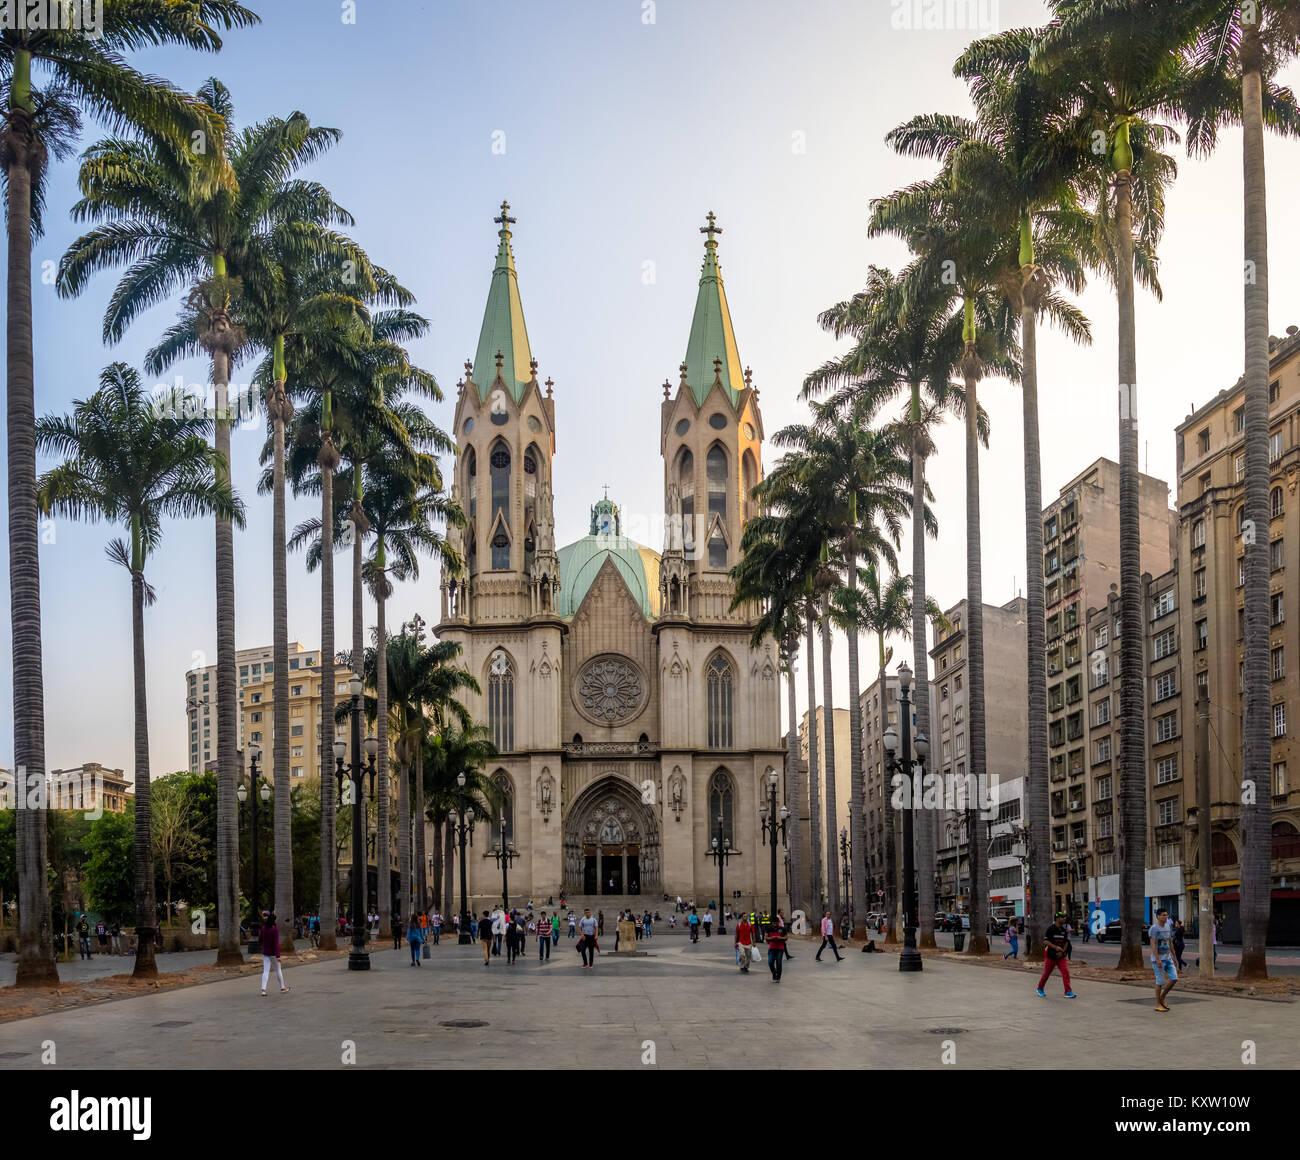 La Catedral - Sao Paulo, Brasil. Imagen De Stock